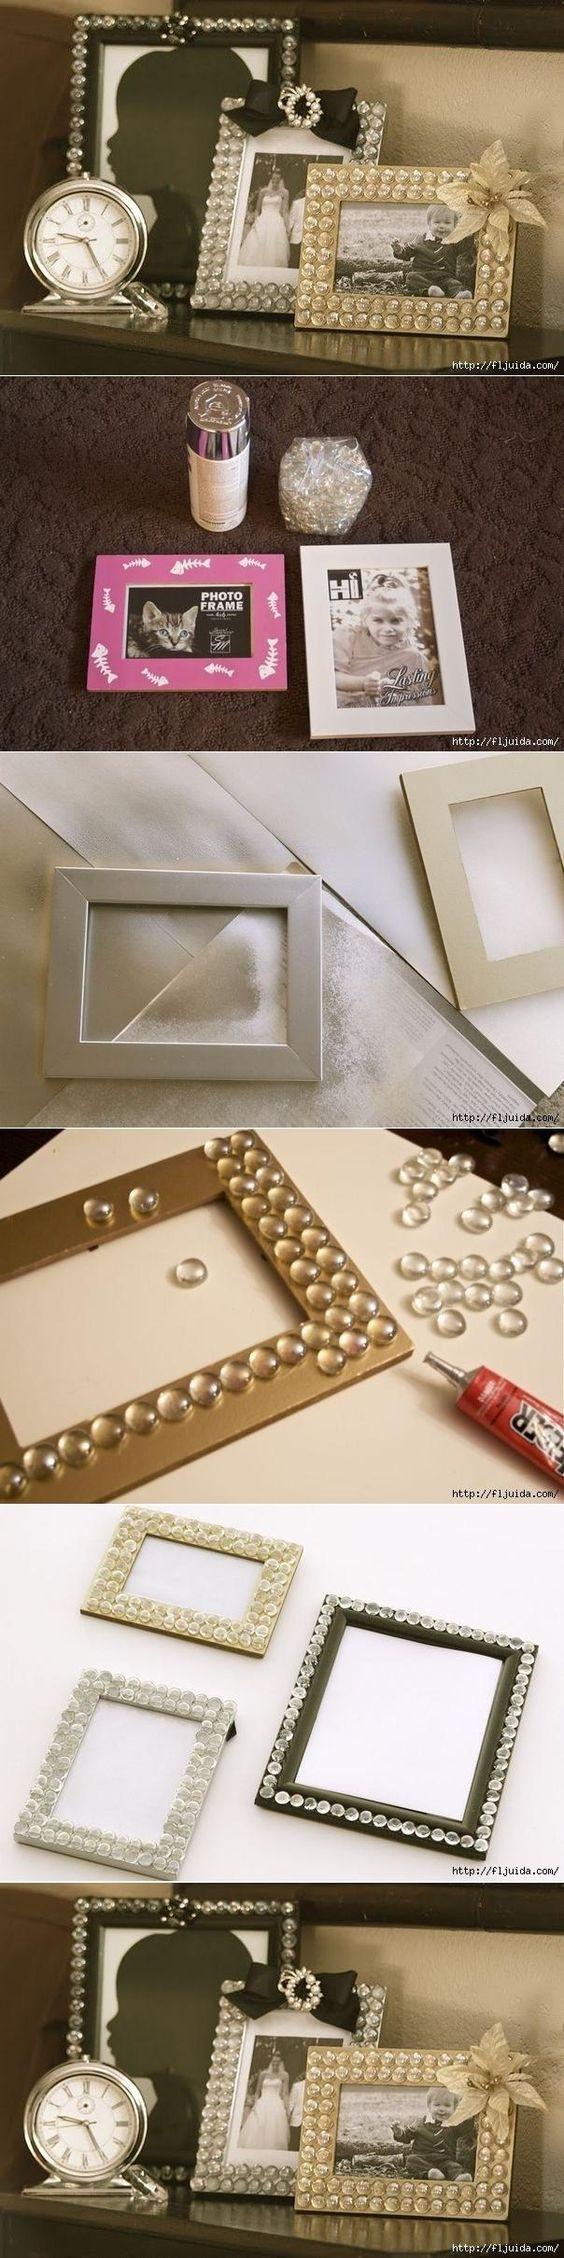 DIY Glamorous Picture Frame DIY Glamorous Picture Frame: